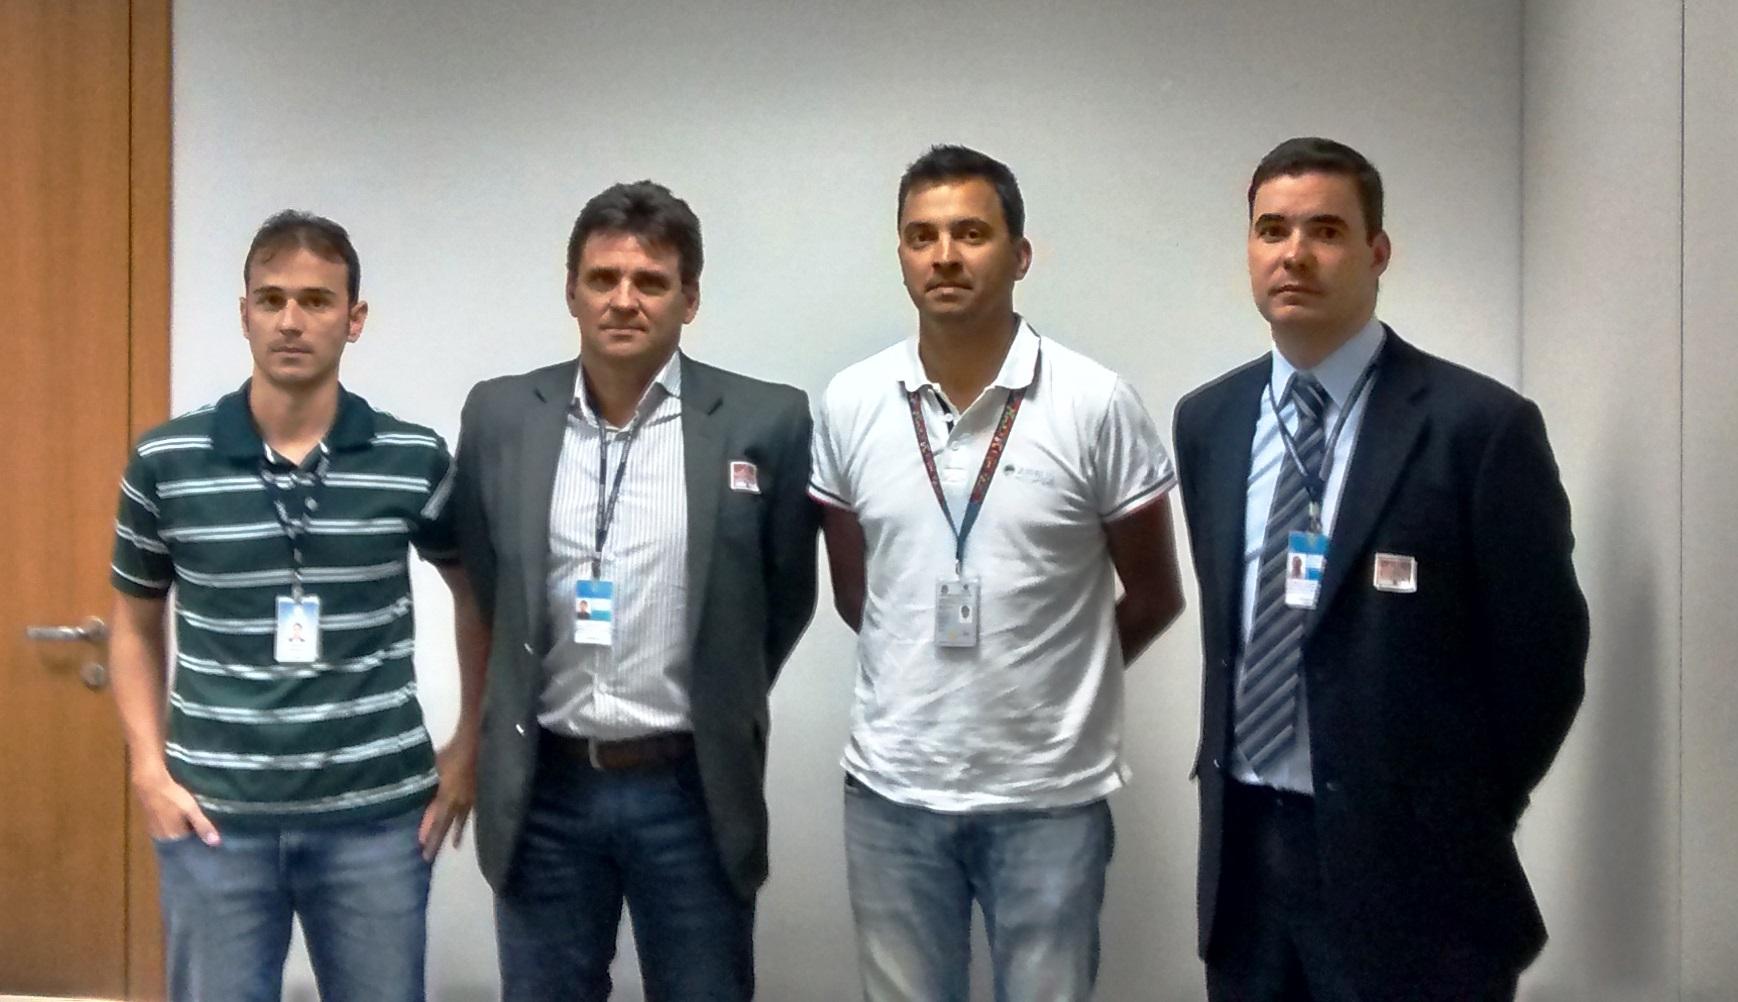 Da esquerda para direita: Rafael Boaventura de Barros (ANAC), Cel PMGO Mauro Douglas Ribeiro (SENASP), Marcelo Guerrante Guimaraes (ANAC) e Cap PMESP Alex Mena Barreto (SENASP).